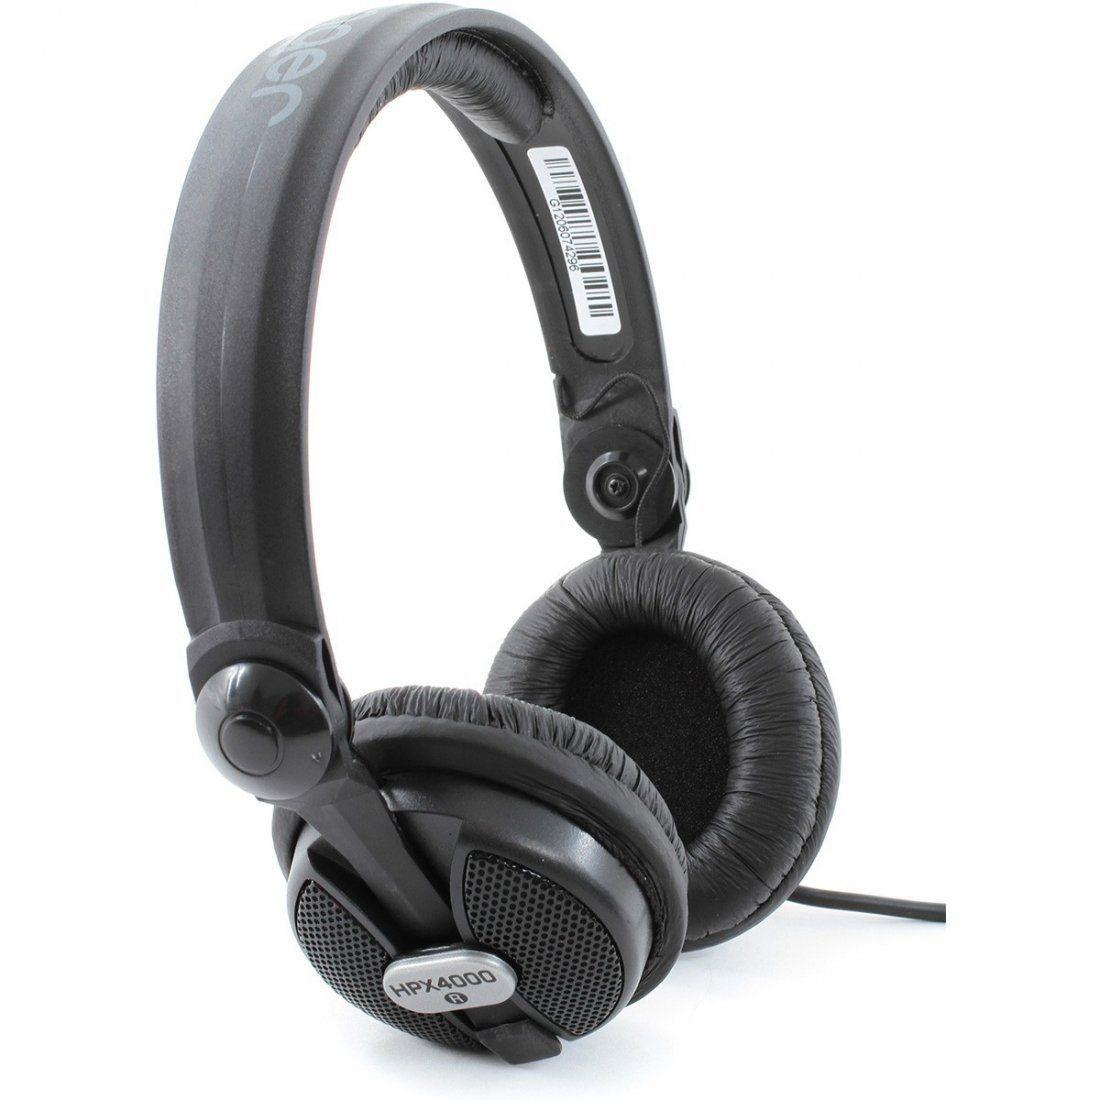 Fone De Ouvido Behringer Hpx4000 Profissional Over Ear